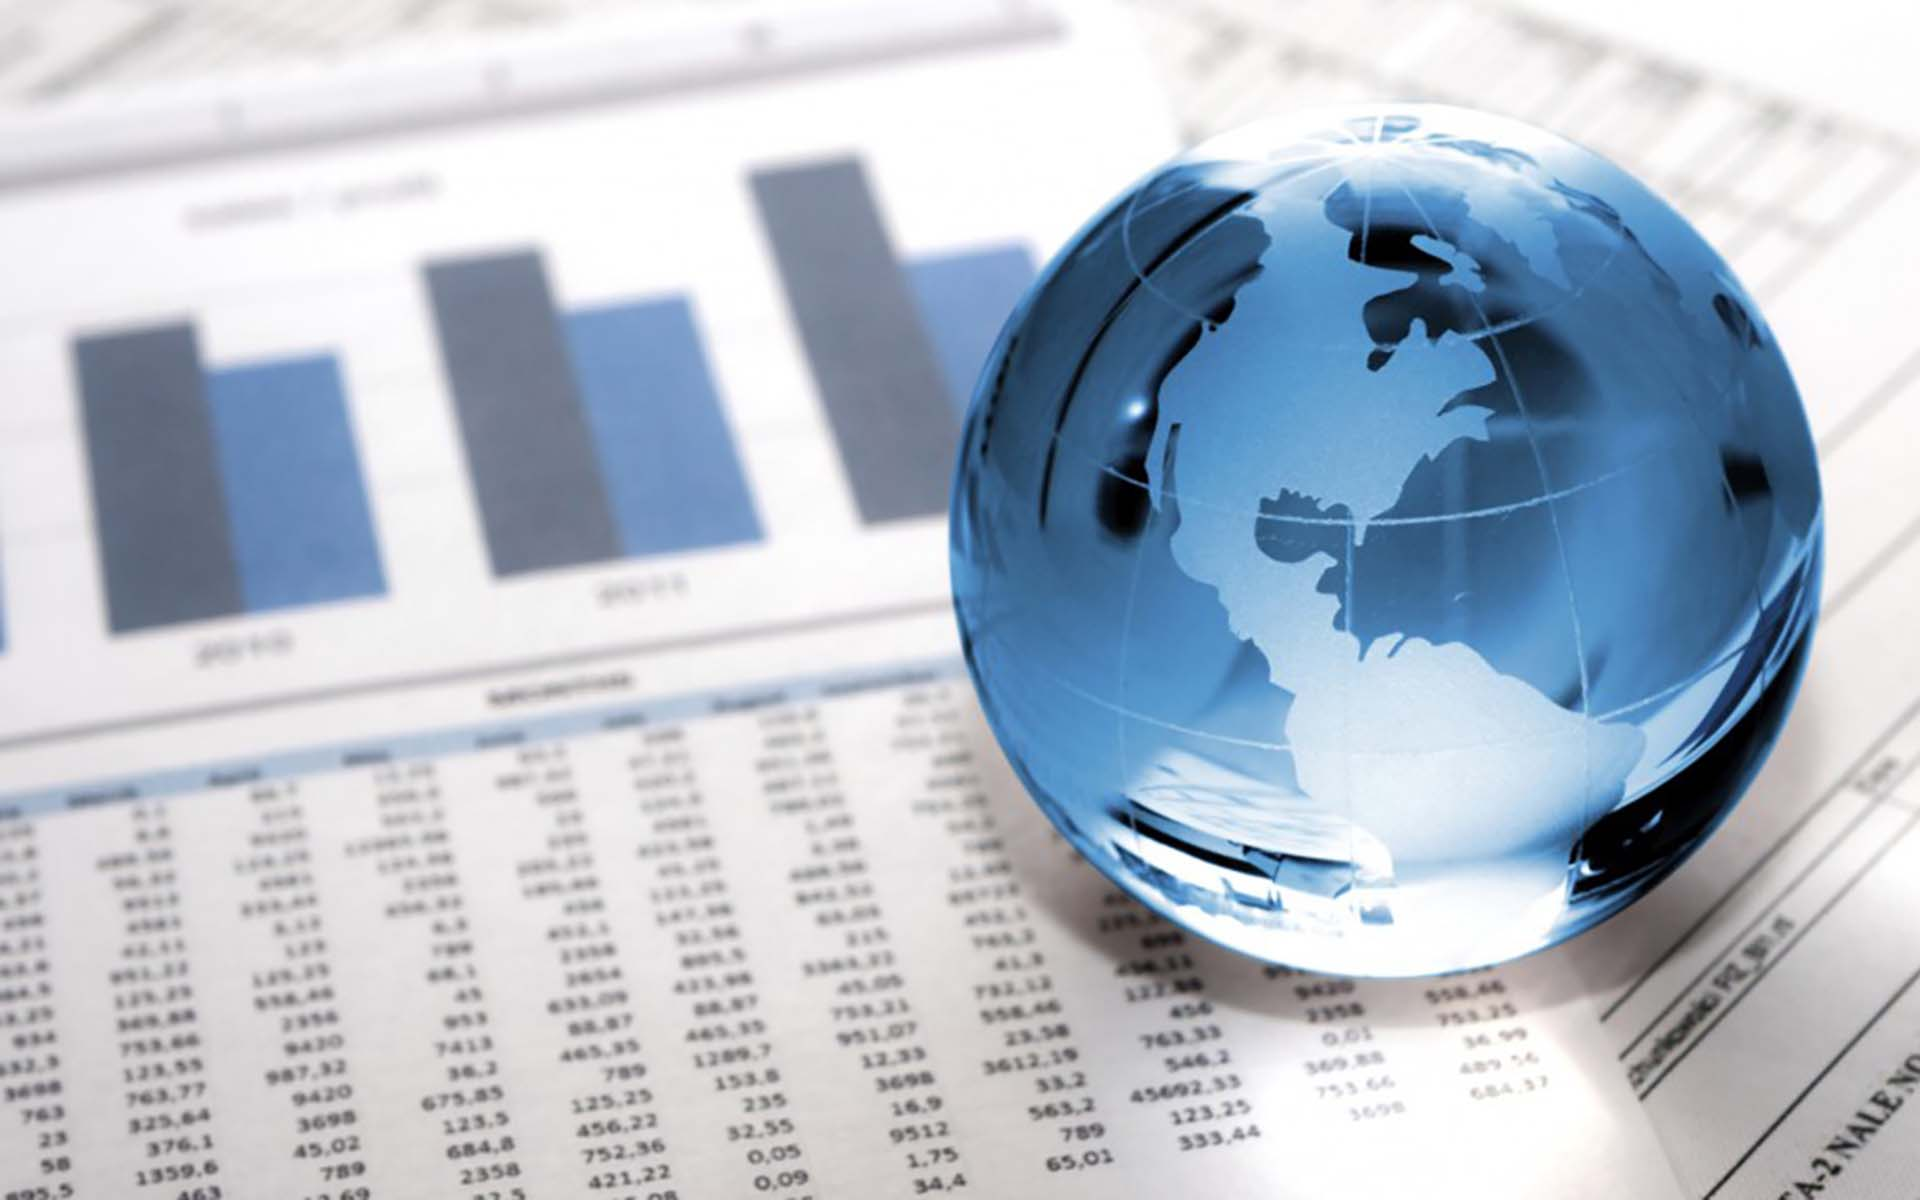 Disrupting the World's Economy